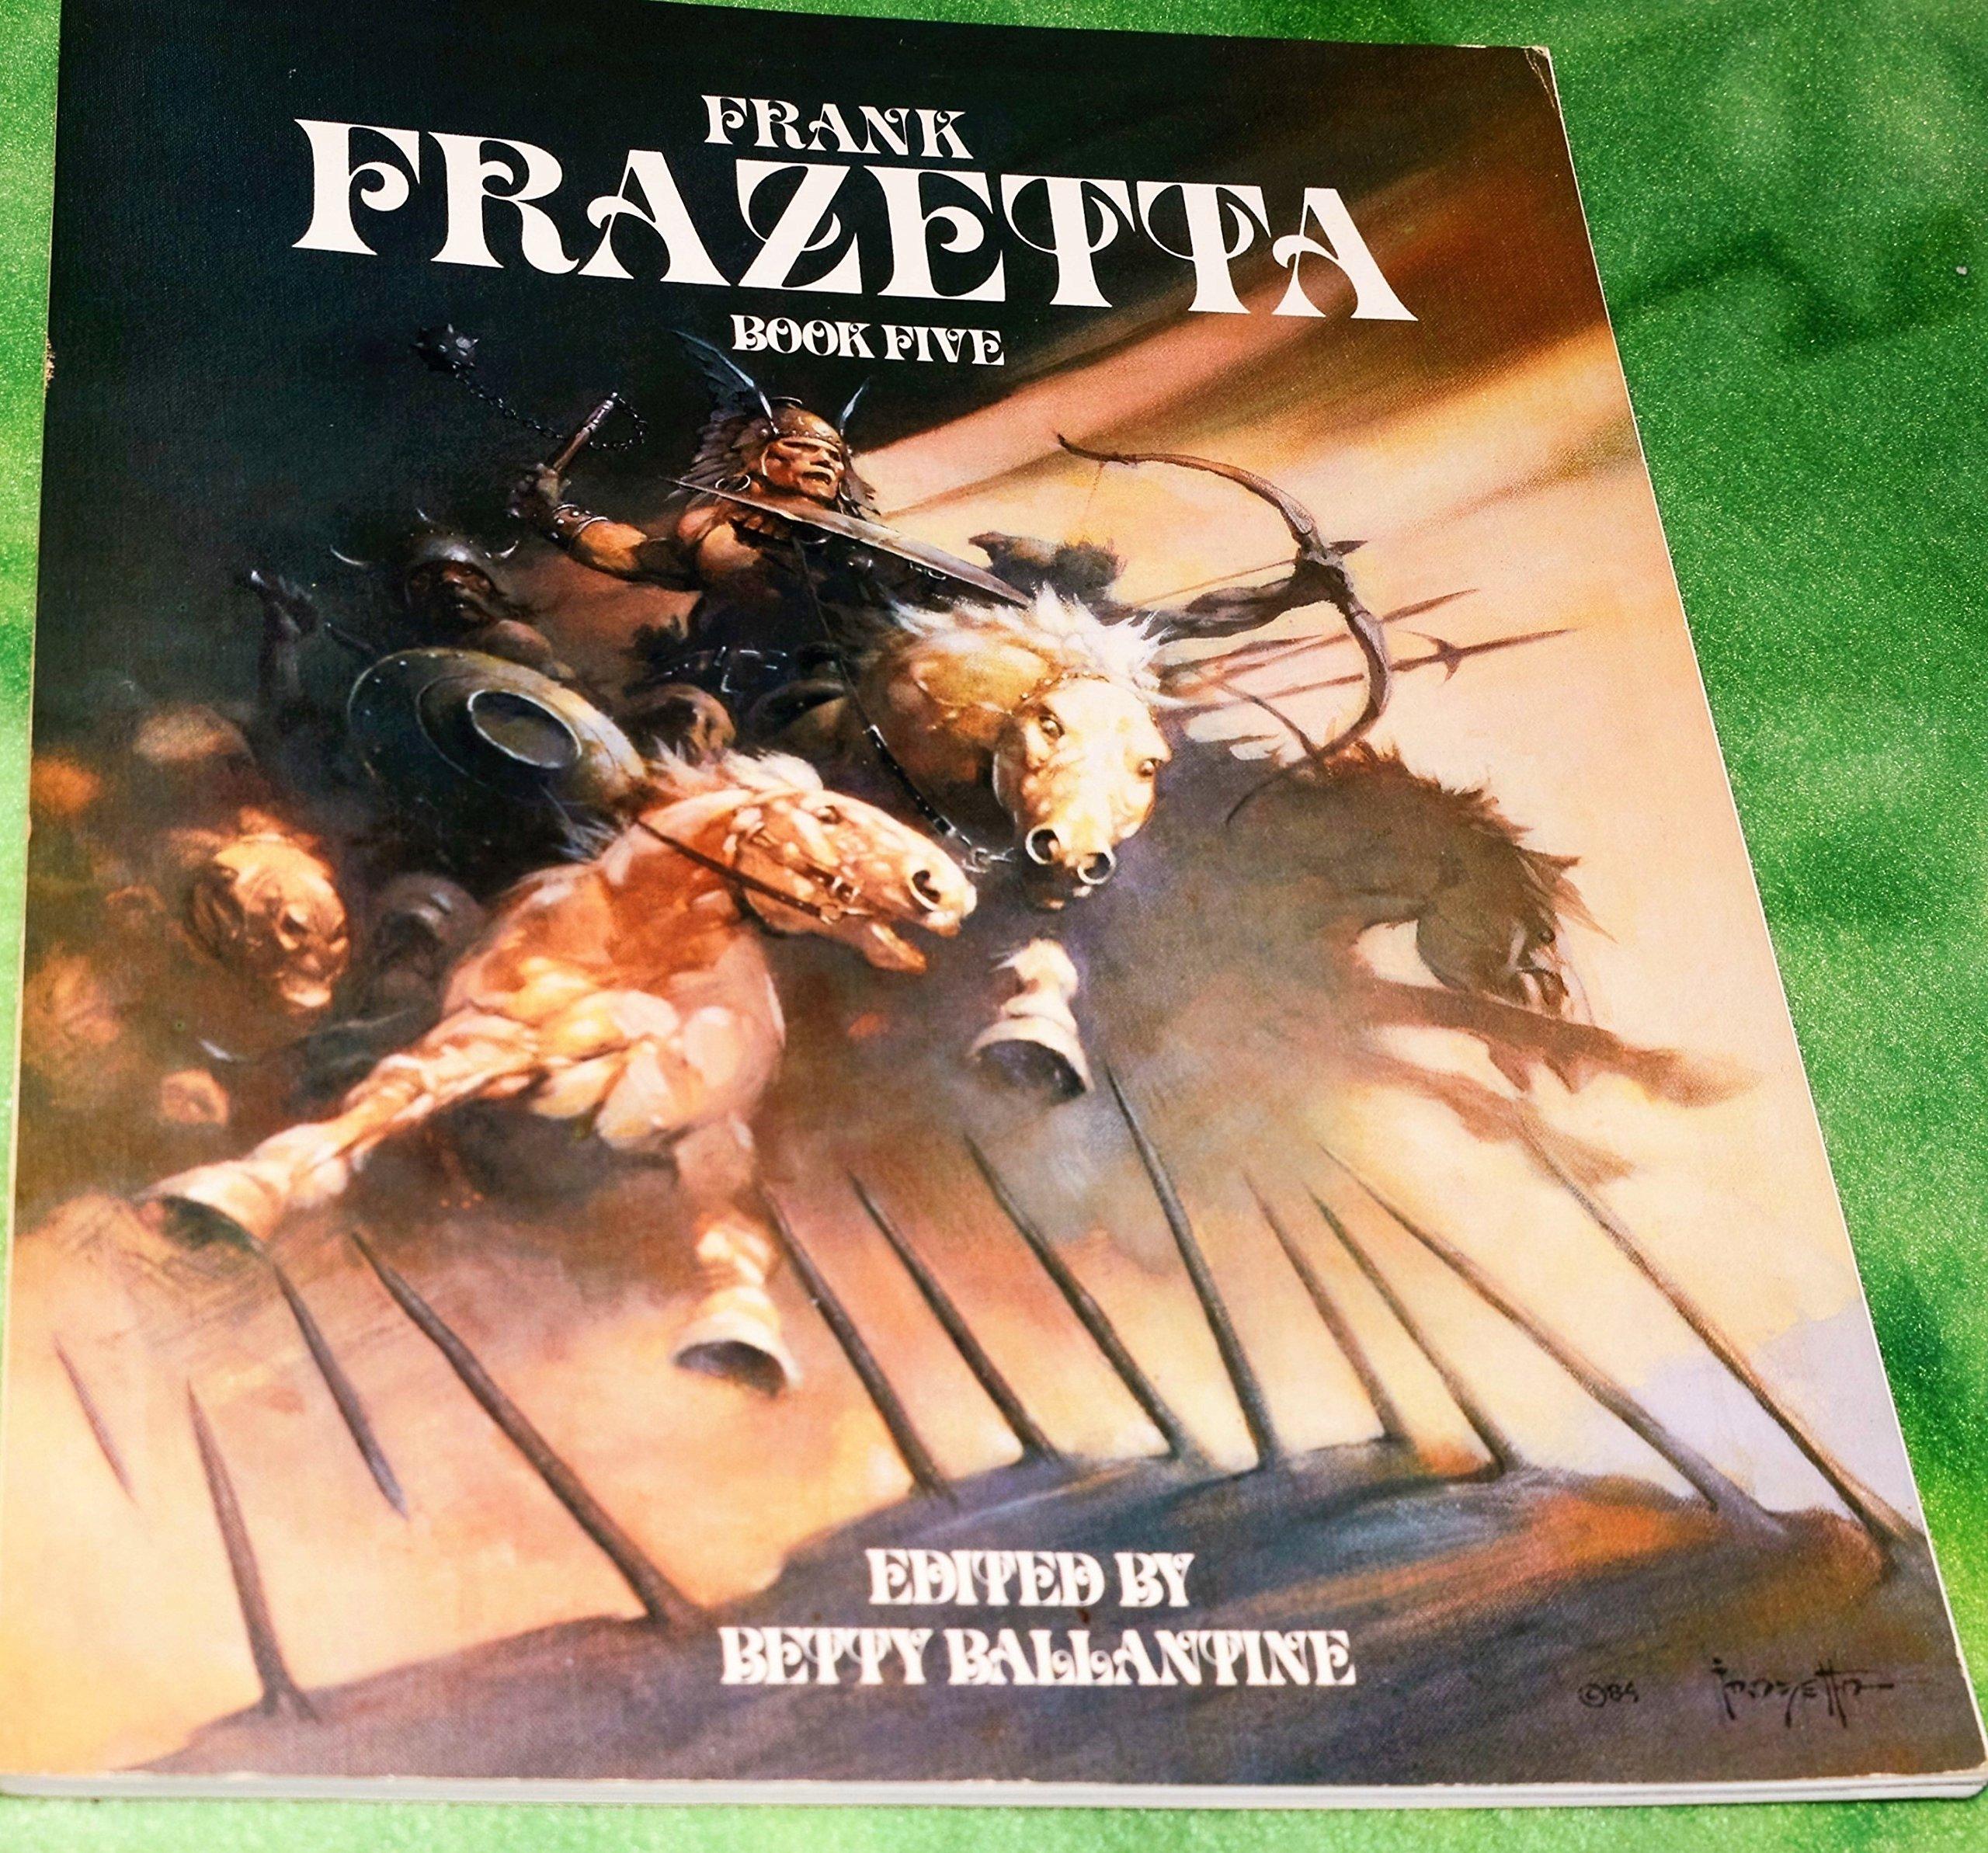 Frank Frazetta: Book five: Frank Frazetta: 9780553341751: Amazon.com: Books